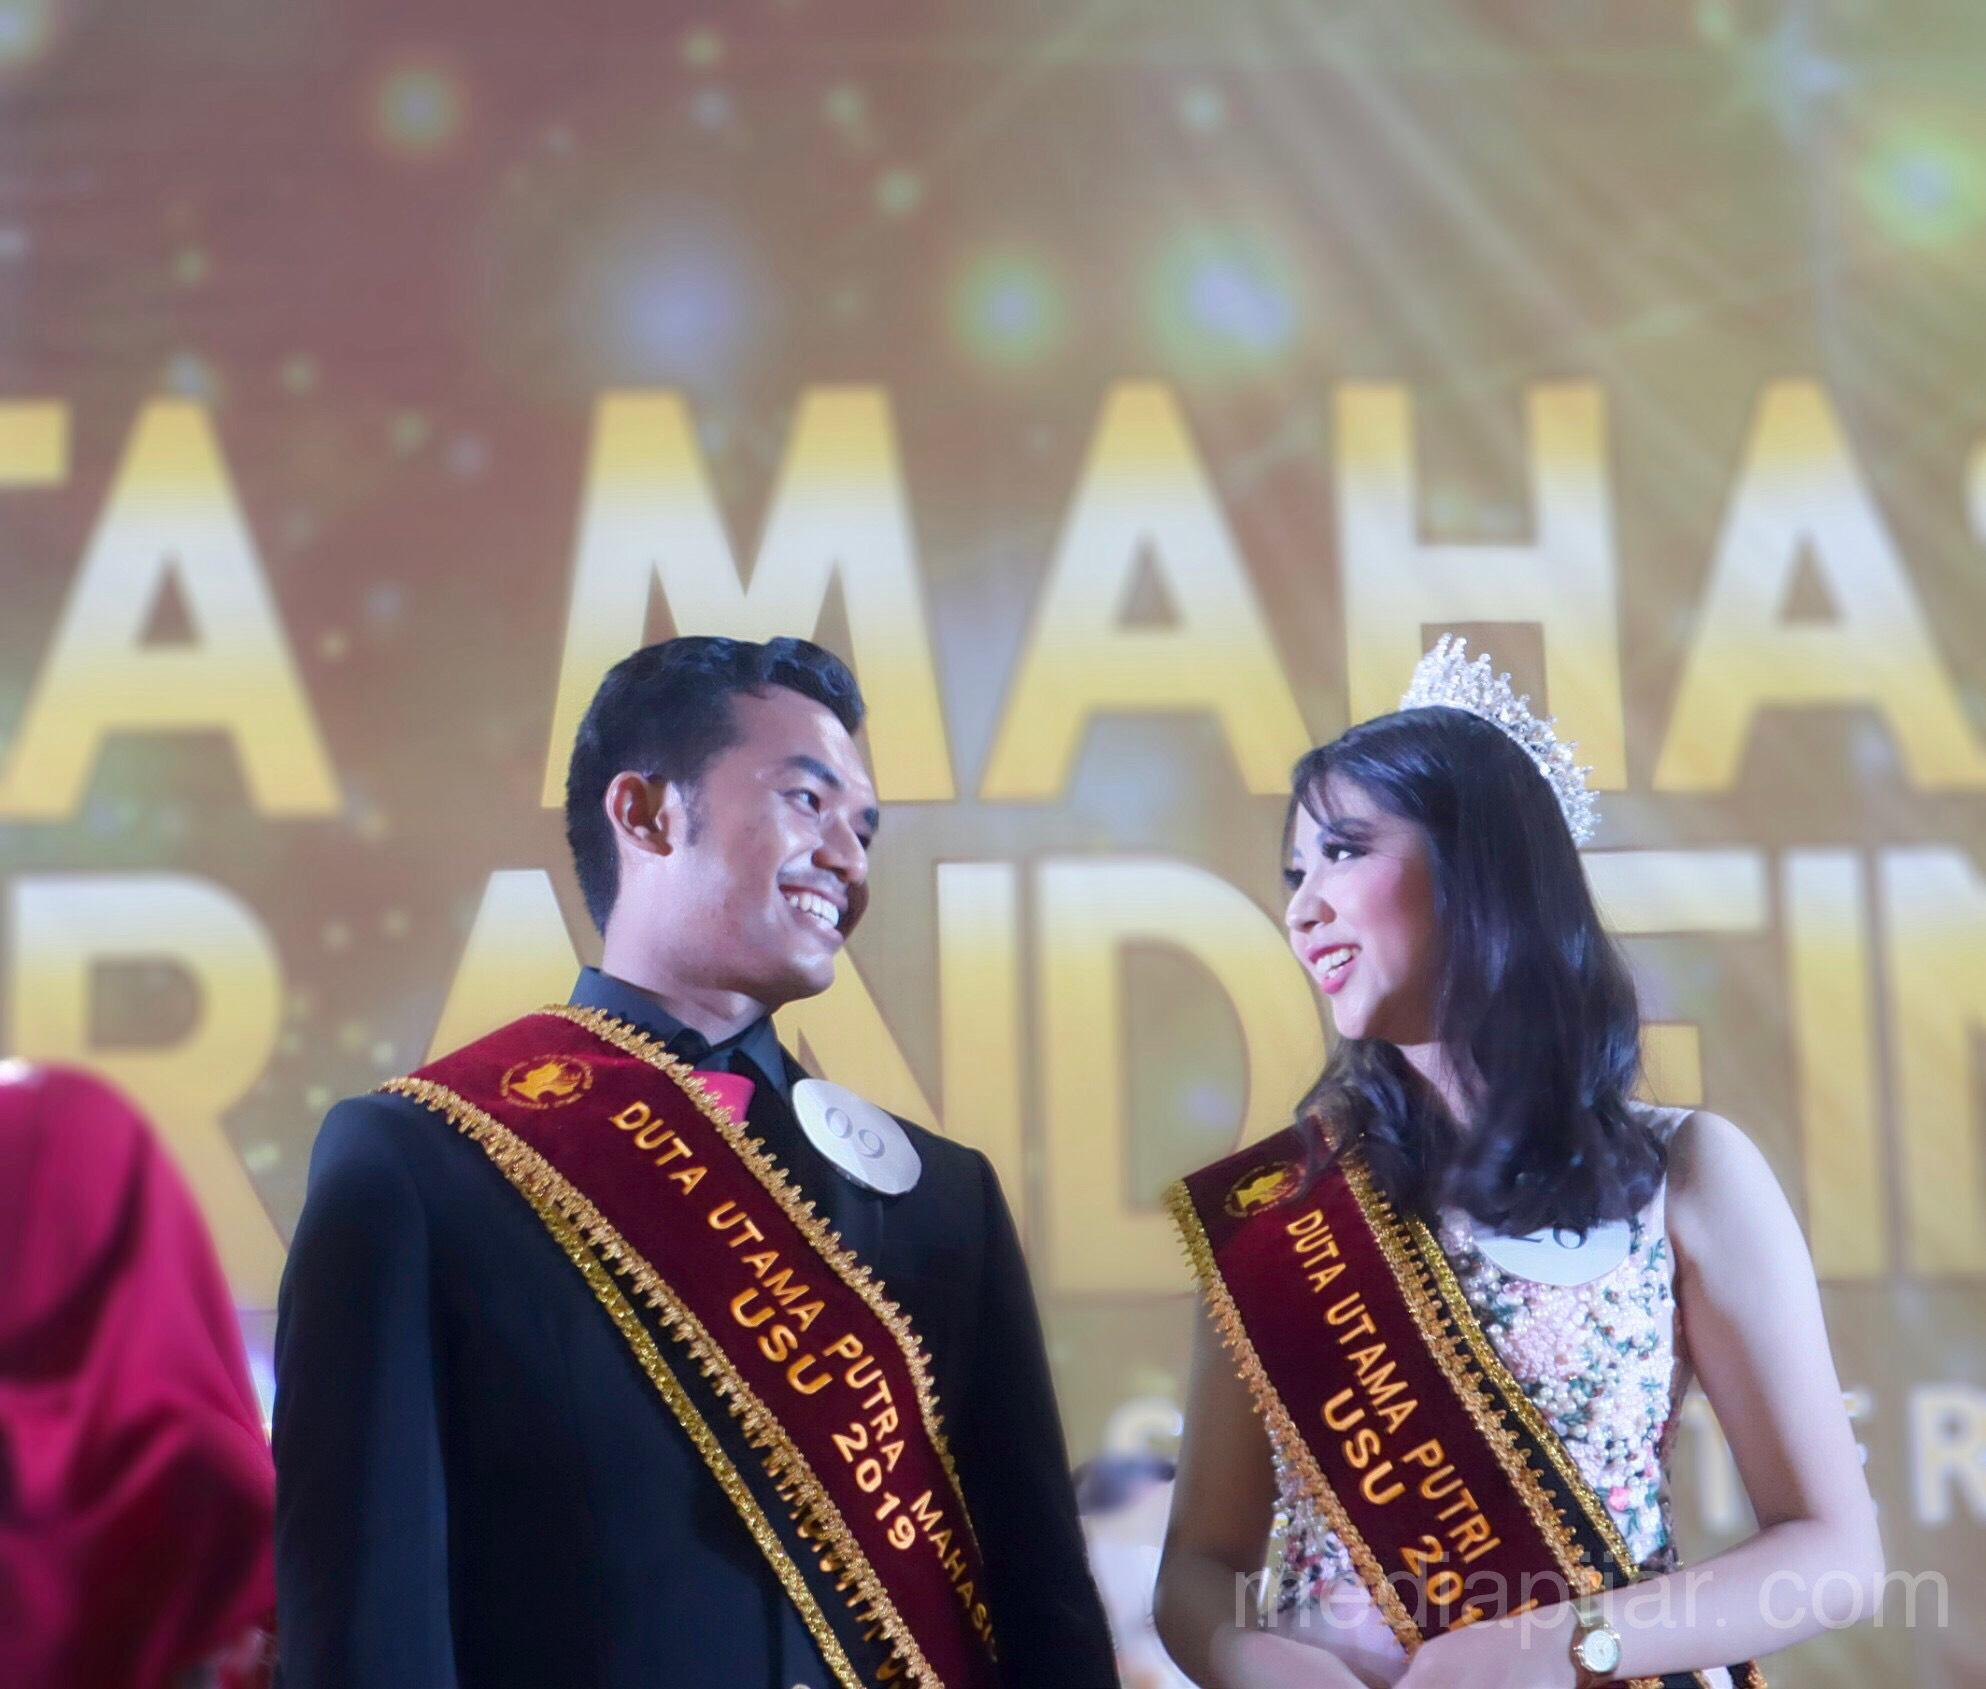 M.Fadhli dan Ridya Wijaya yang merupakan Duta Utama Mahasiswa USU 2019 (23/11). (Fotografer: Hazlina Ganif Sihotang)